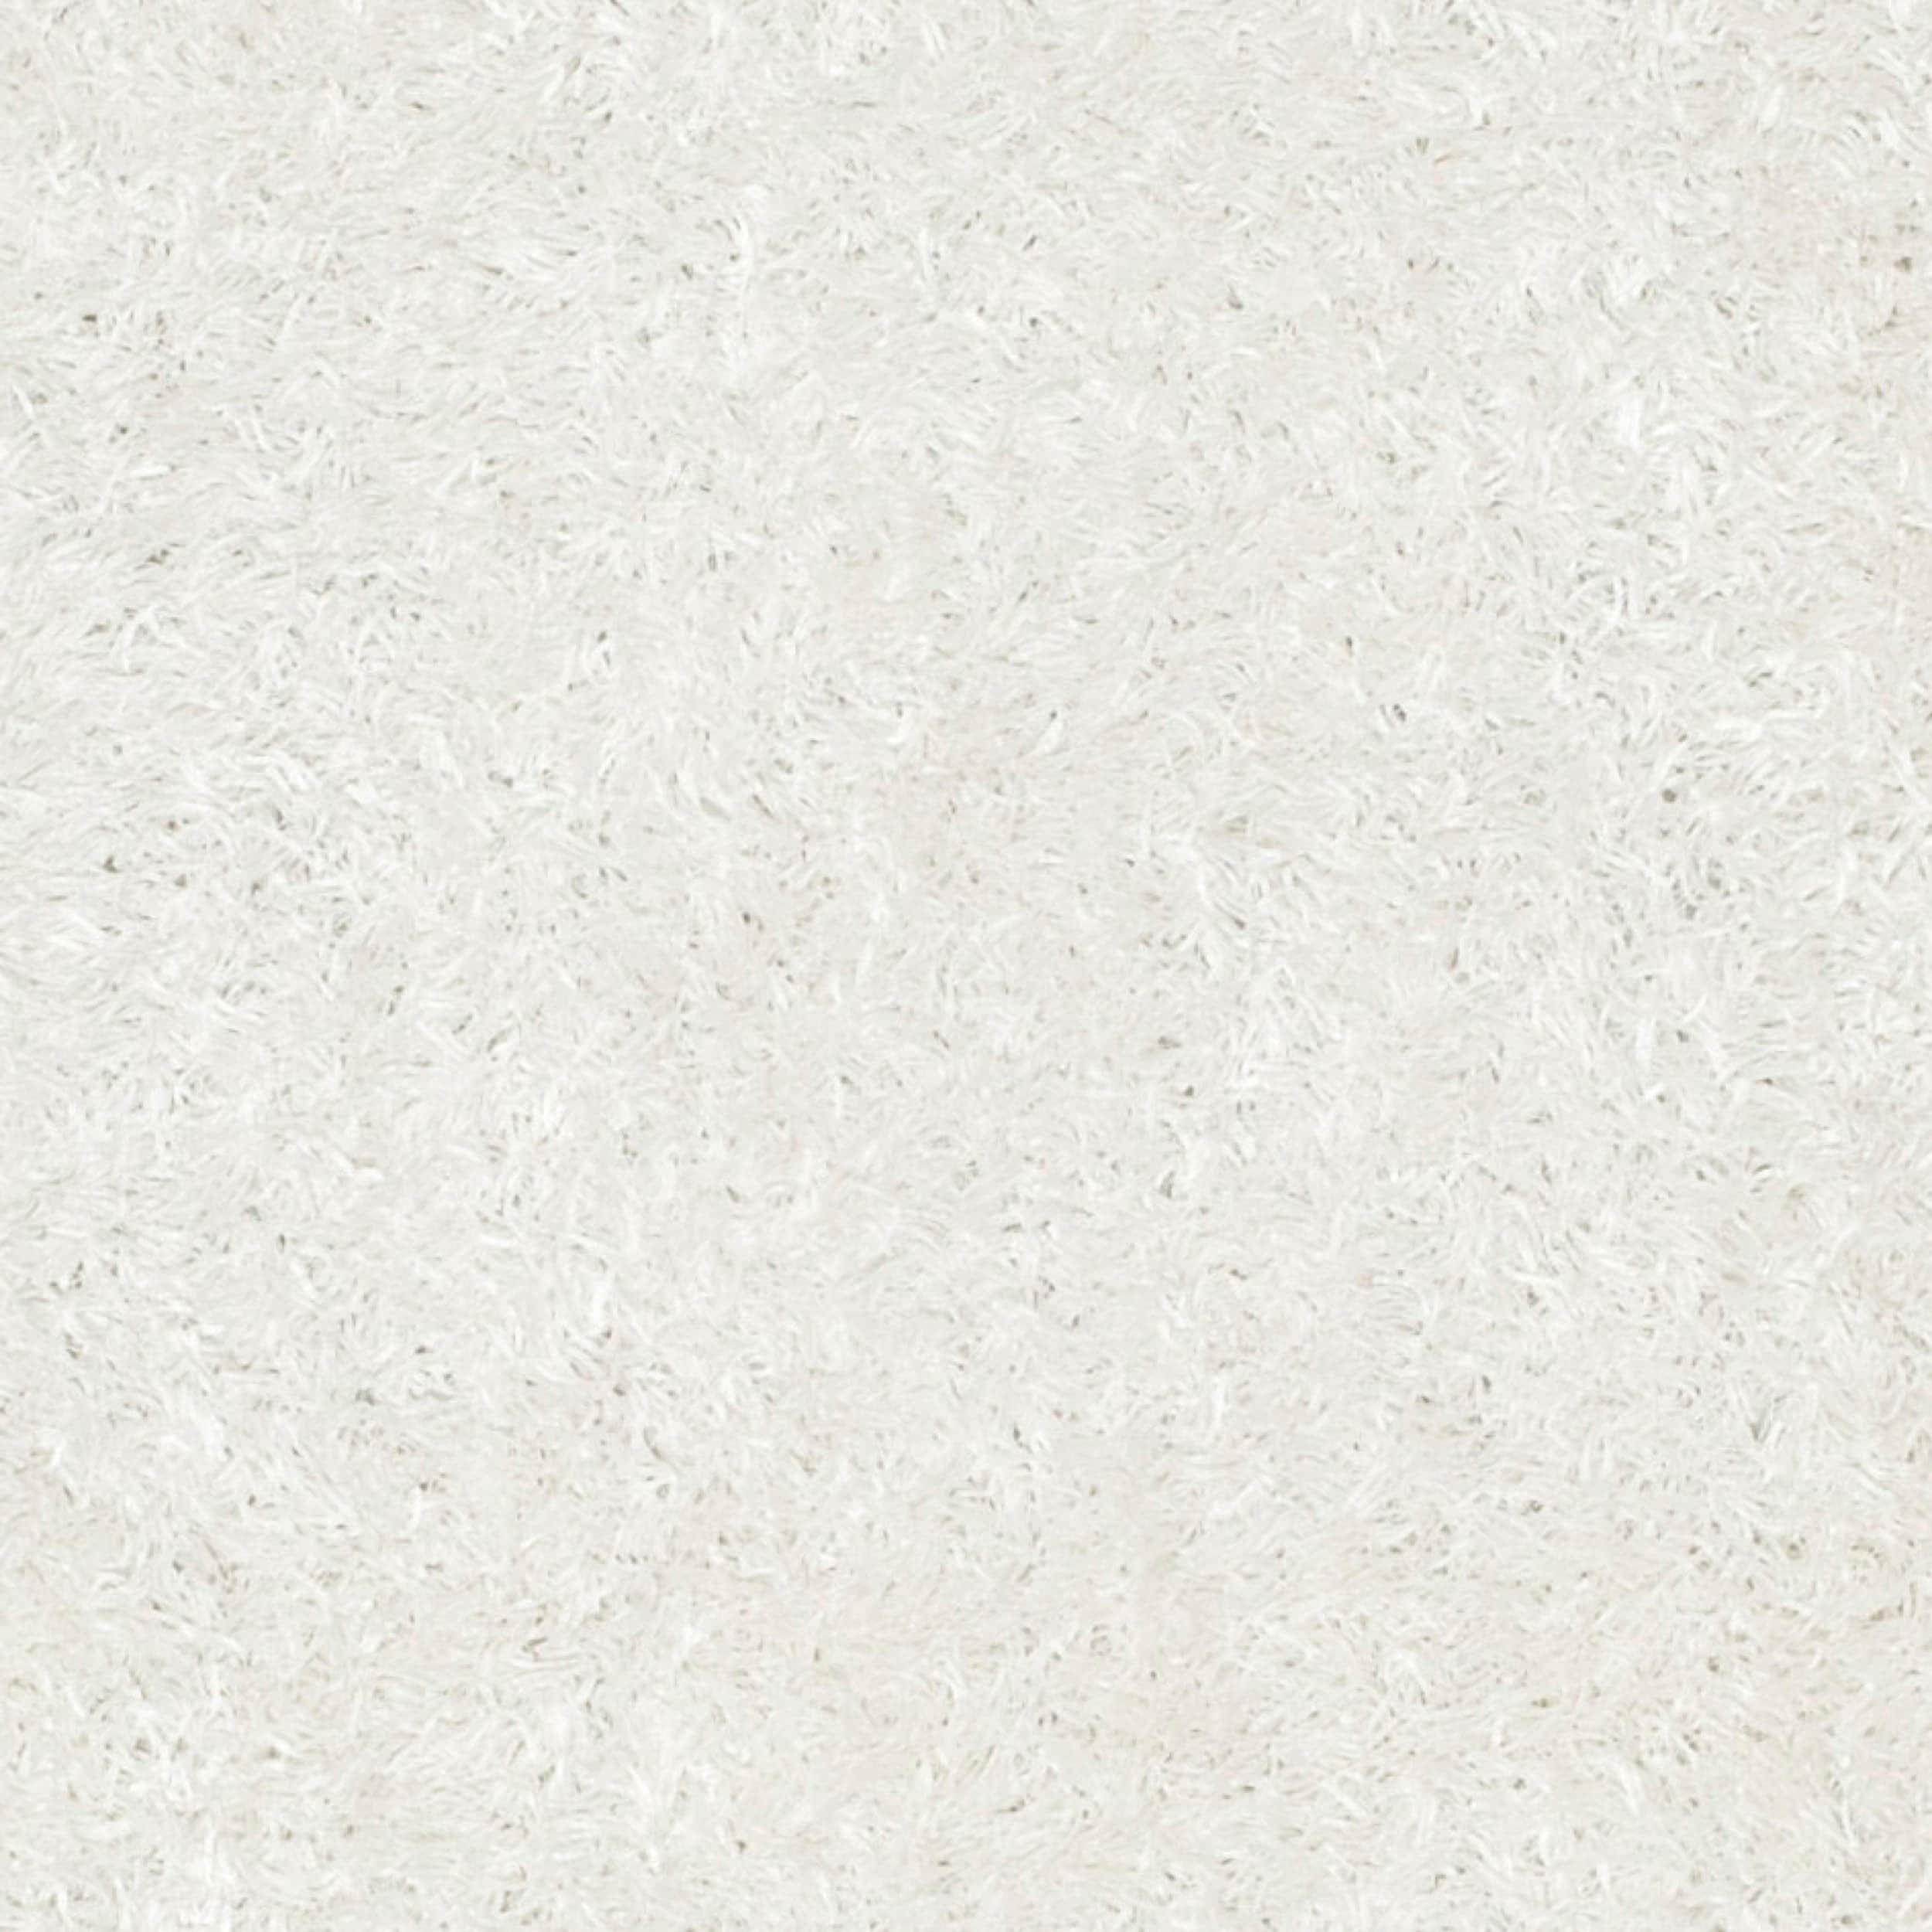 Safavieh Handmade New Orleans Shag Off White Textured Polyester Area